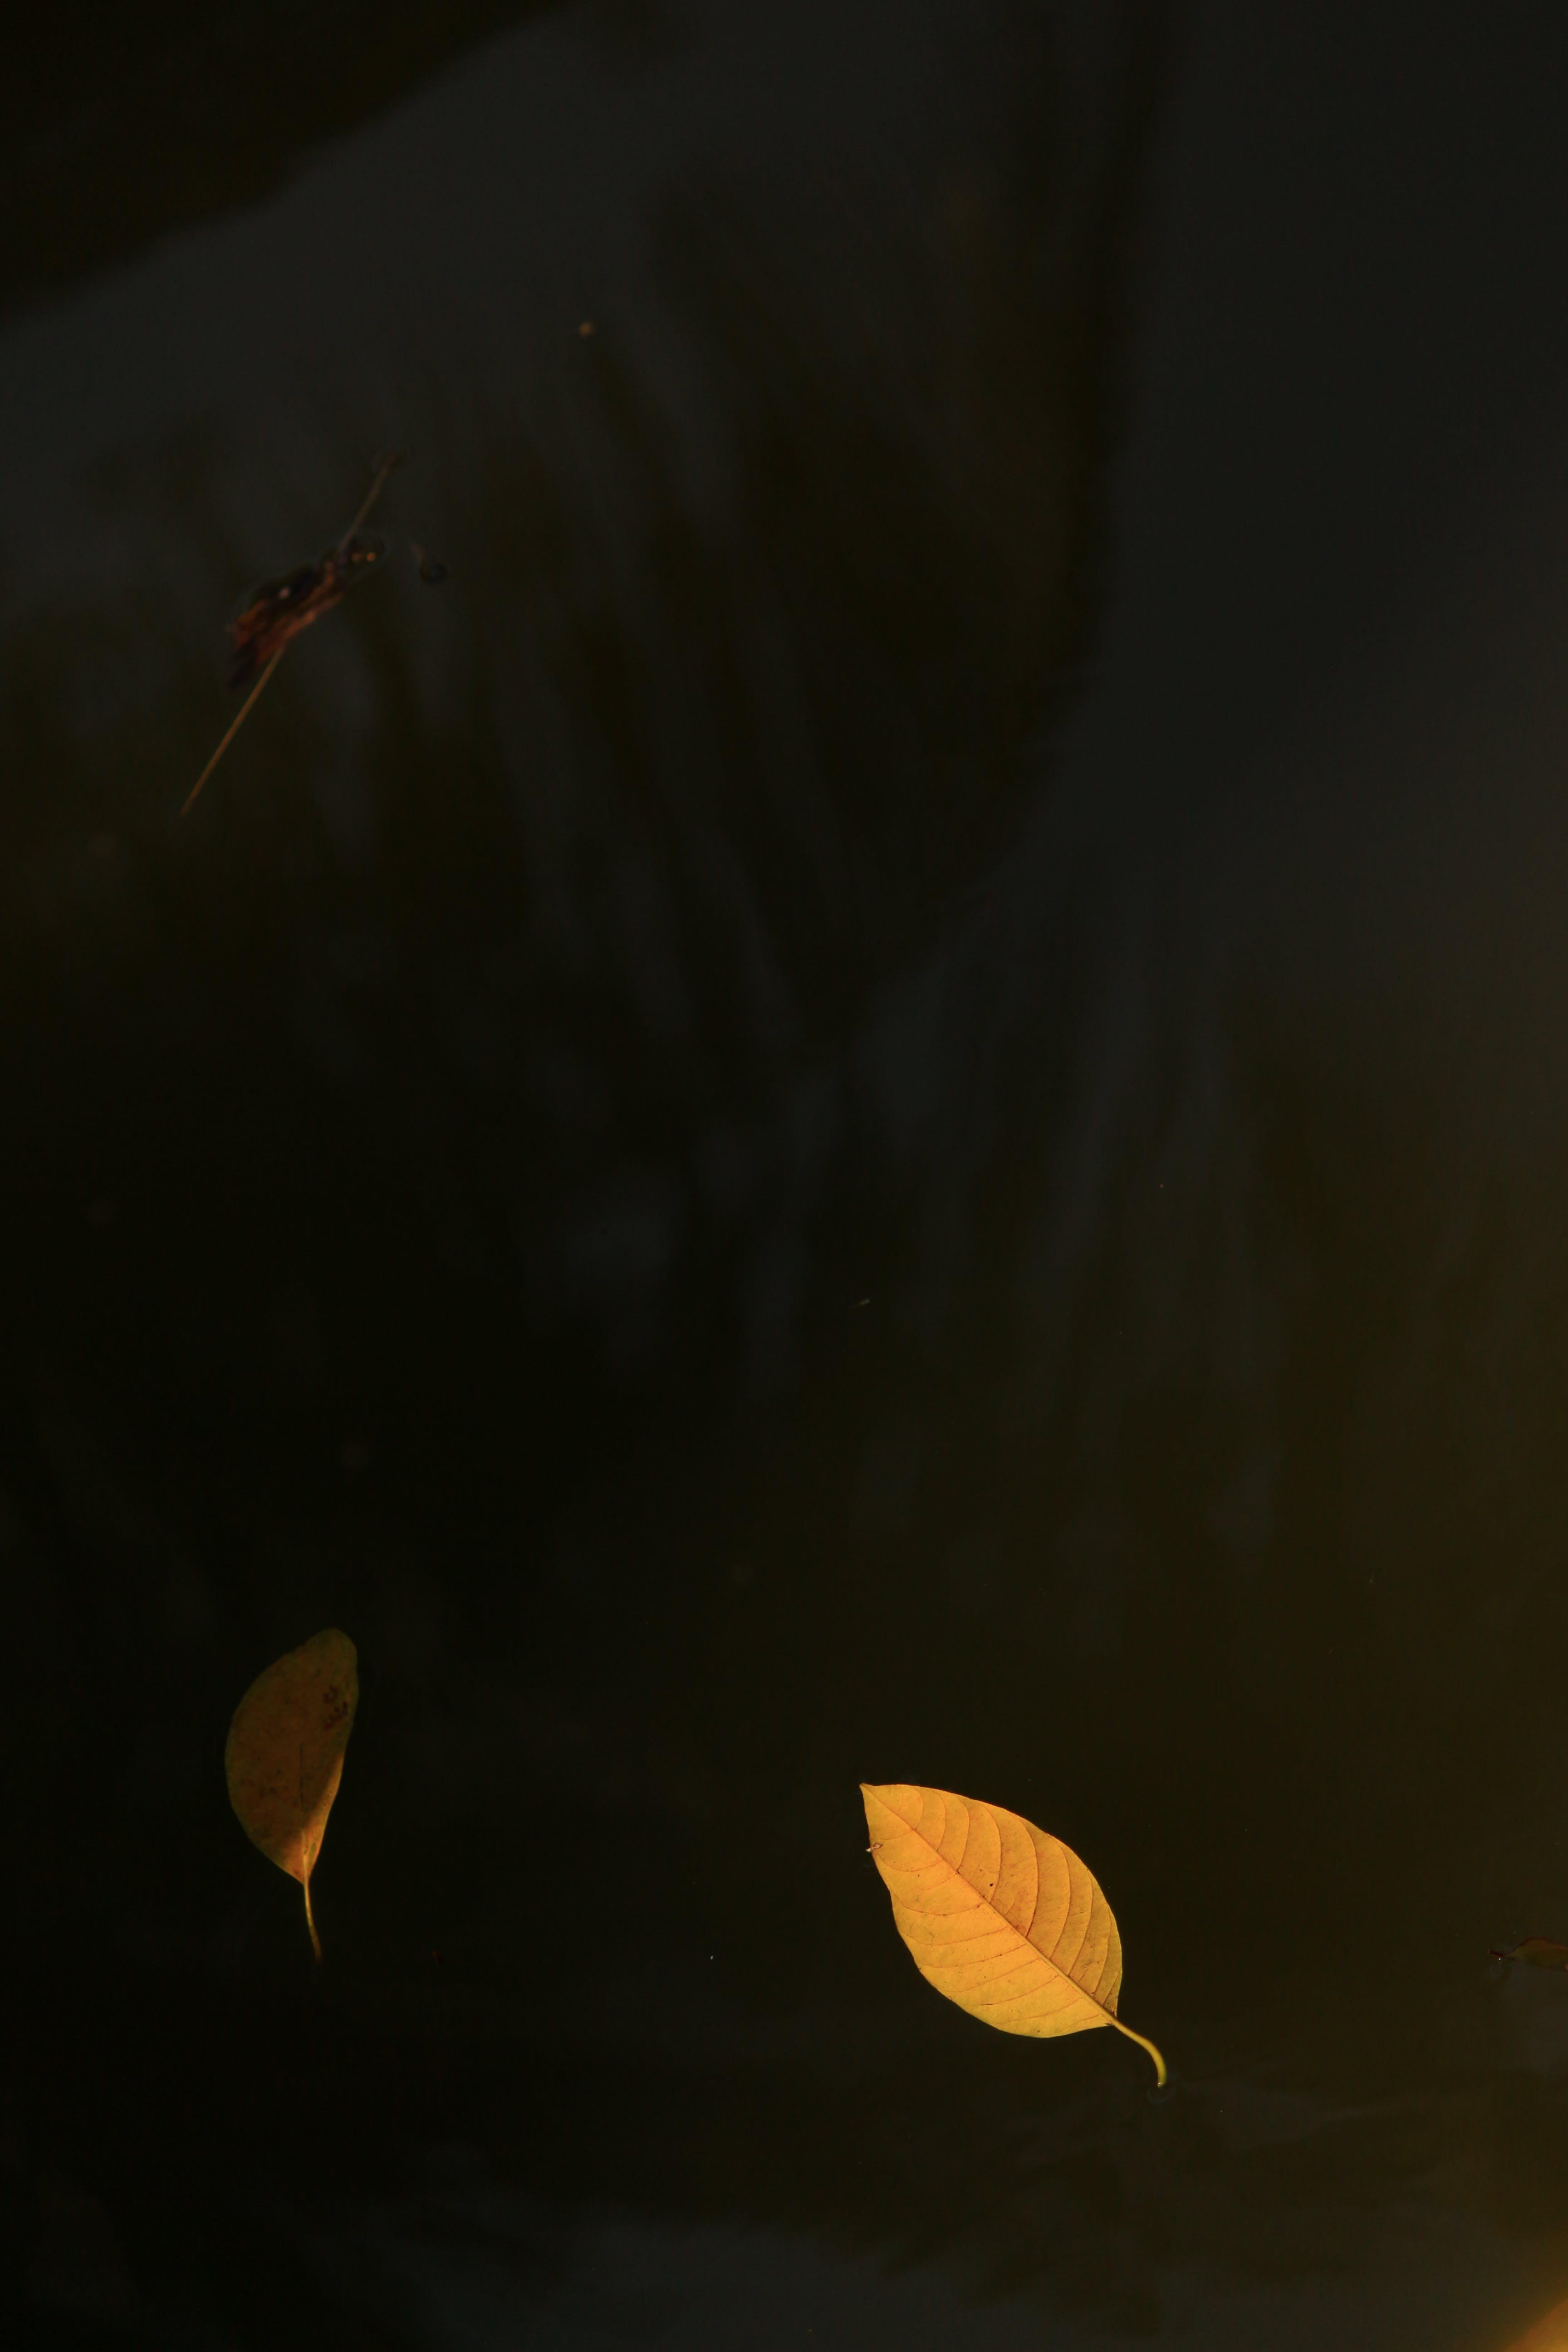 Free stock photo of autumn leaf, leaf, leaf on water, yellow leaf